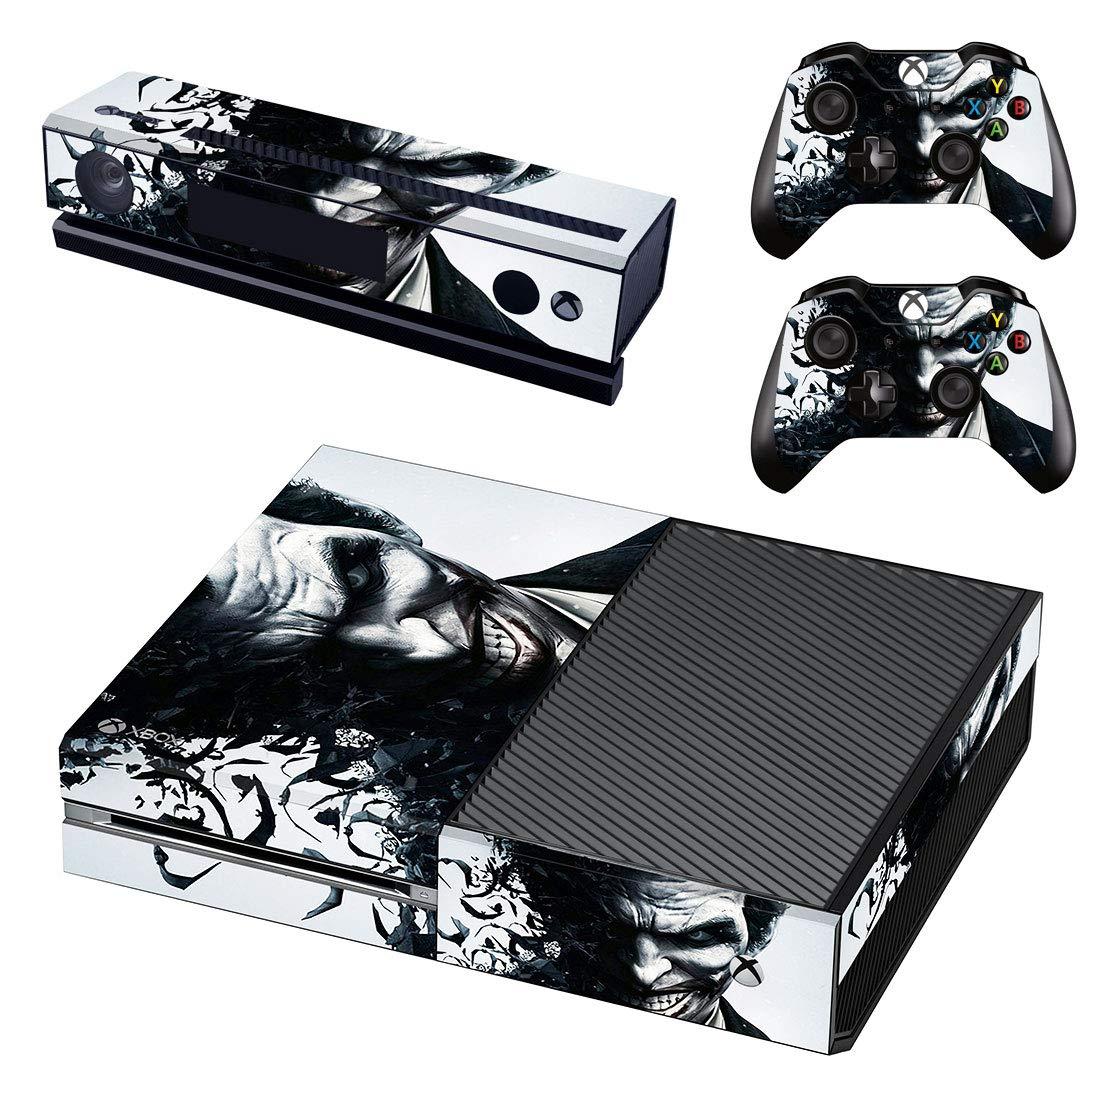 Adventure Games - XBOX ONE ORIGINAL - Joker - Playstation 4 Vinyl Console Skin Decal Sticker + 2 Controller Skins Set